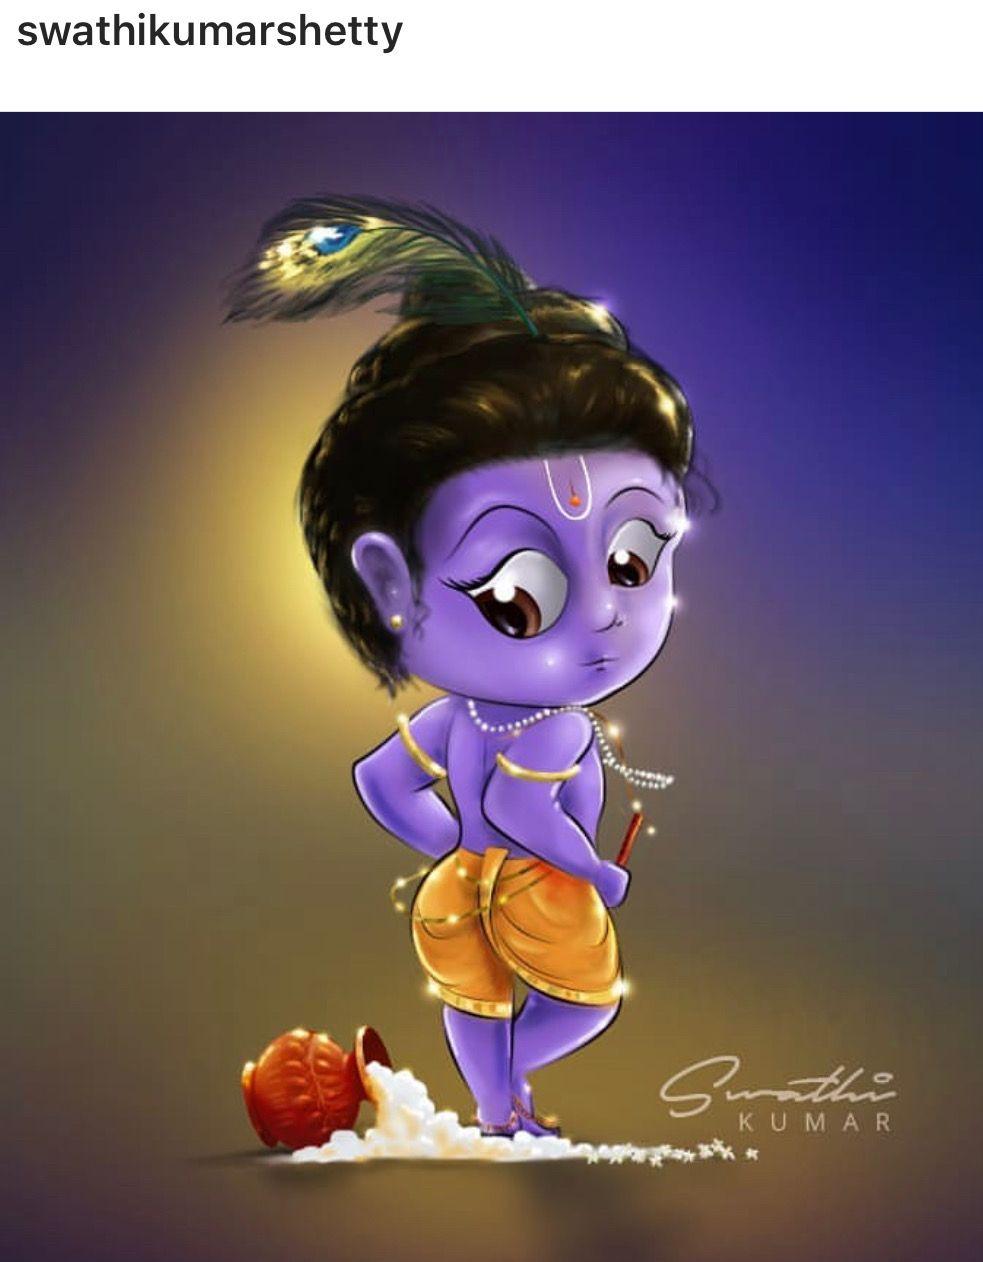 Jai Shri Krishna Cute Krishna Radha Krishna Art Little Krishna